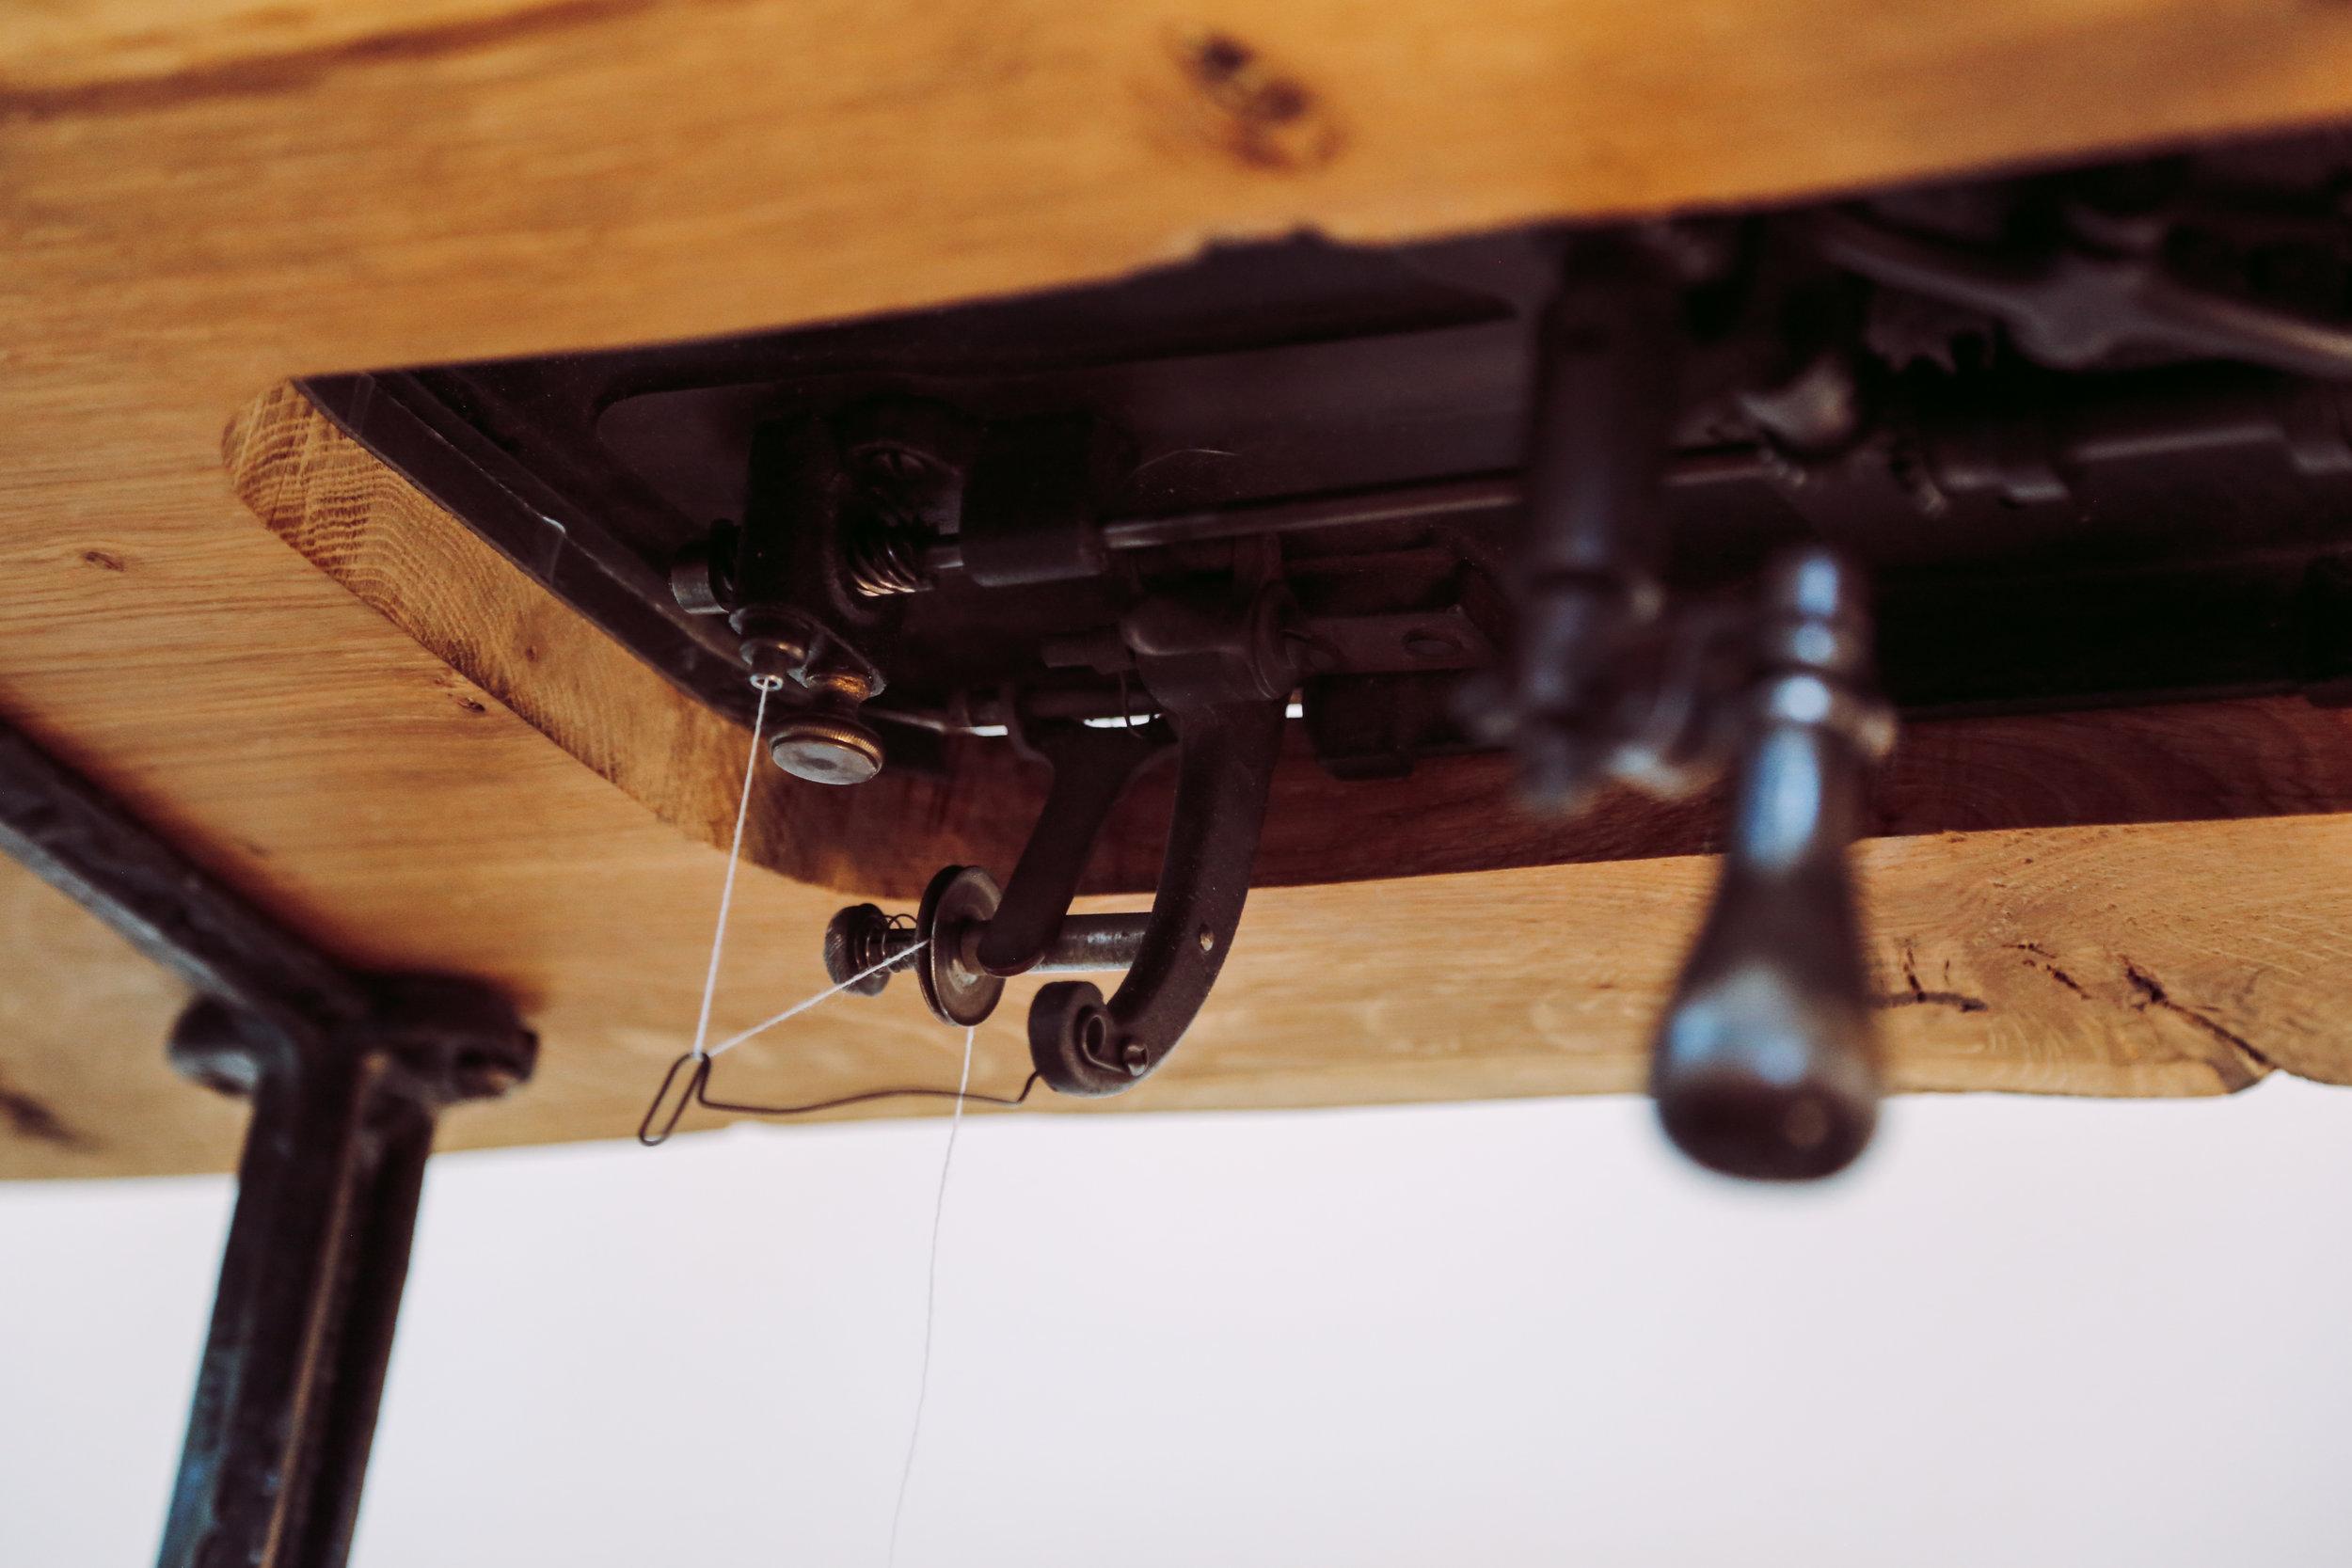 Chainstitch Machine Thread Tension Unit Threading Saint Chains Artisan Embroidery.jpg